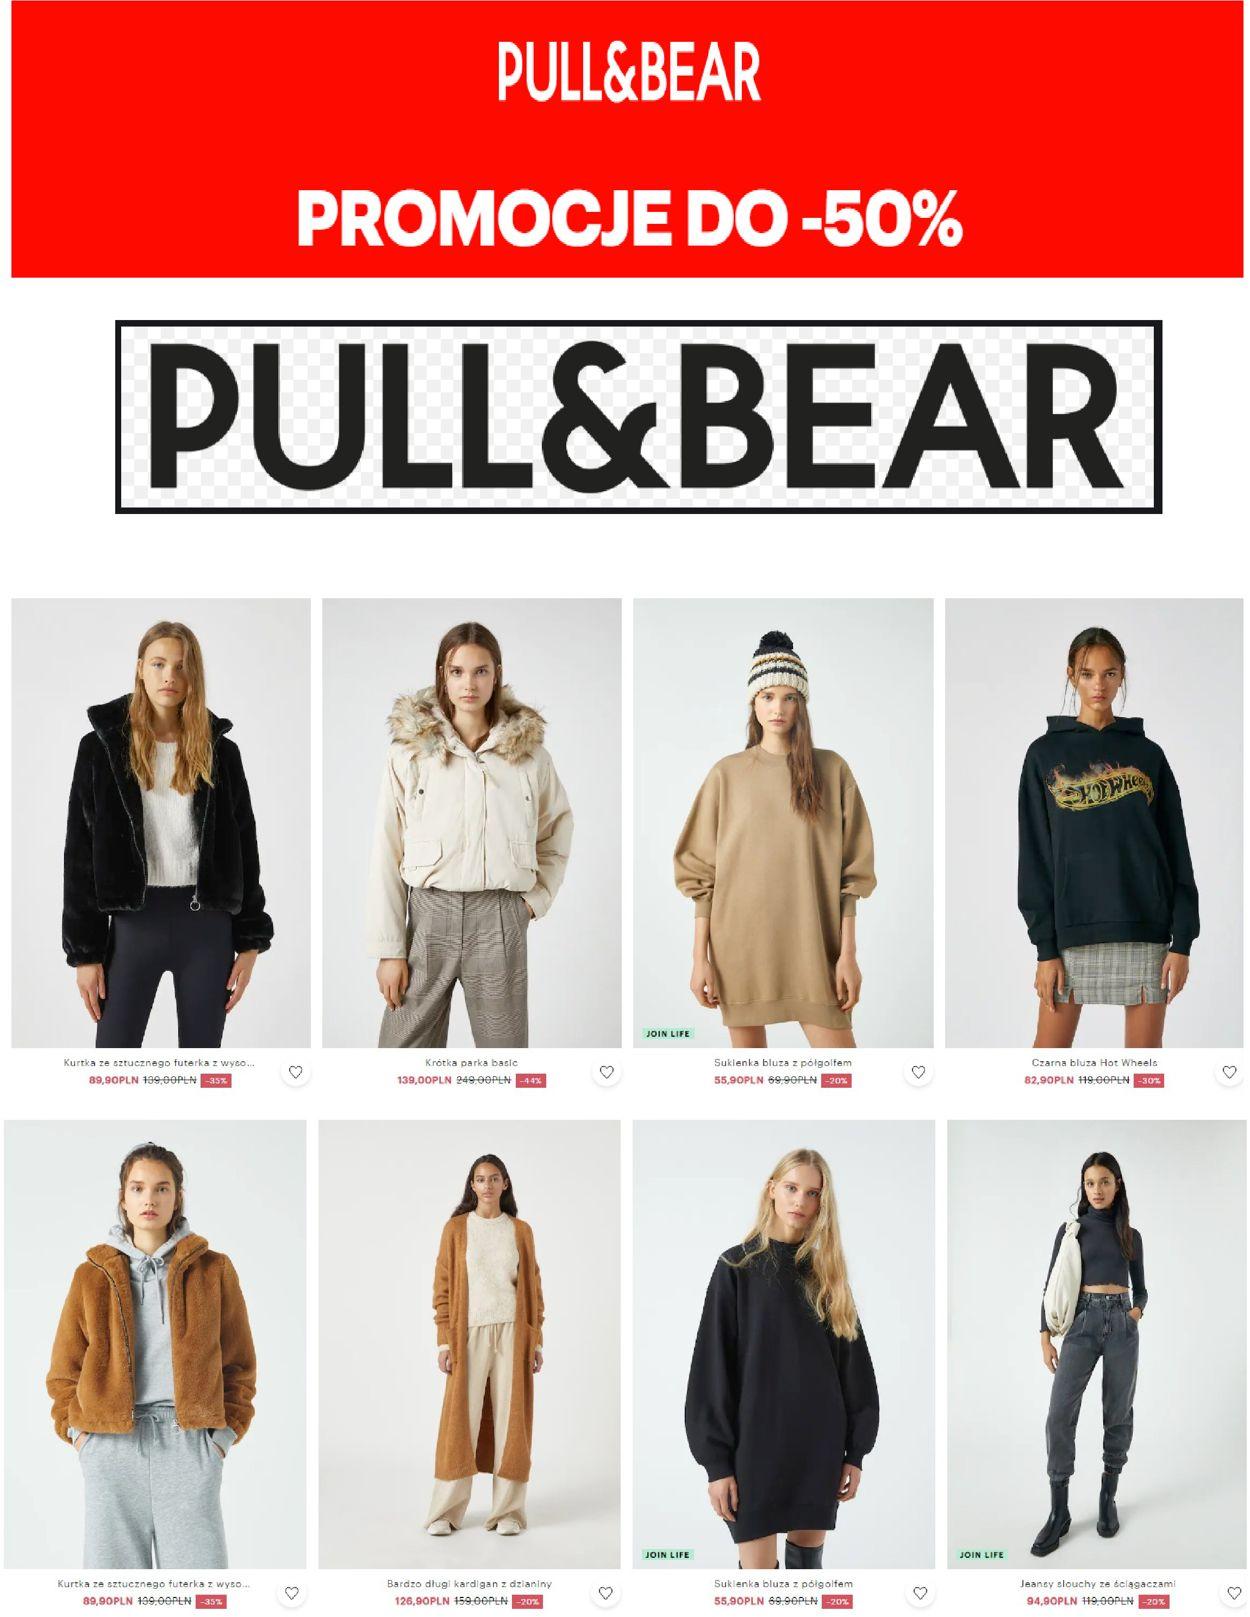 Gazetka promocyjna Pull&Bear Black Friday 2020 - 12.11-25.11.2020